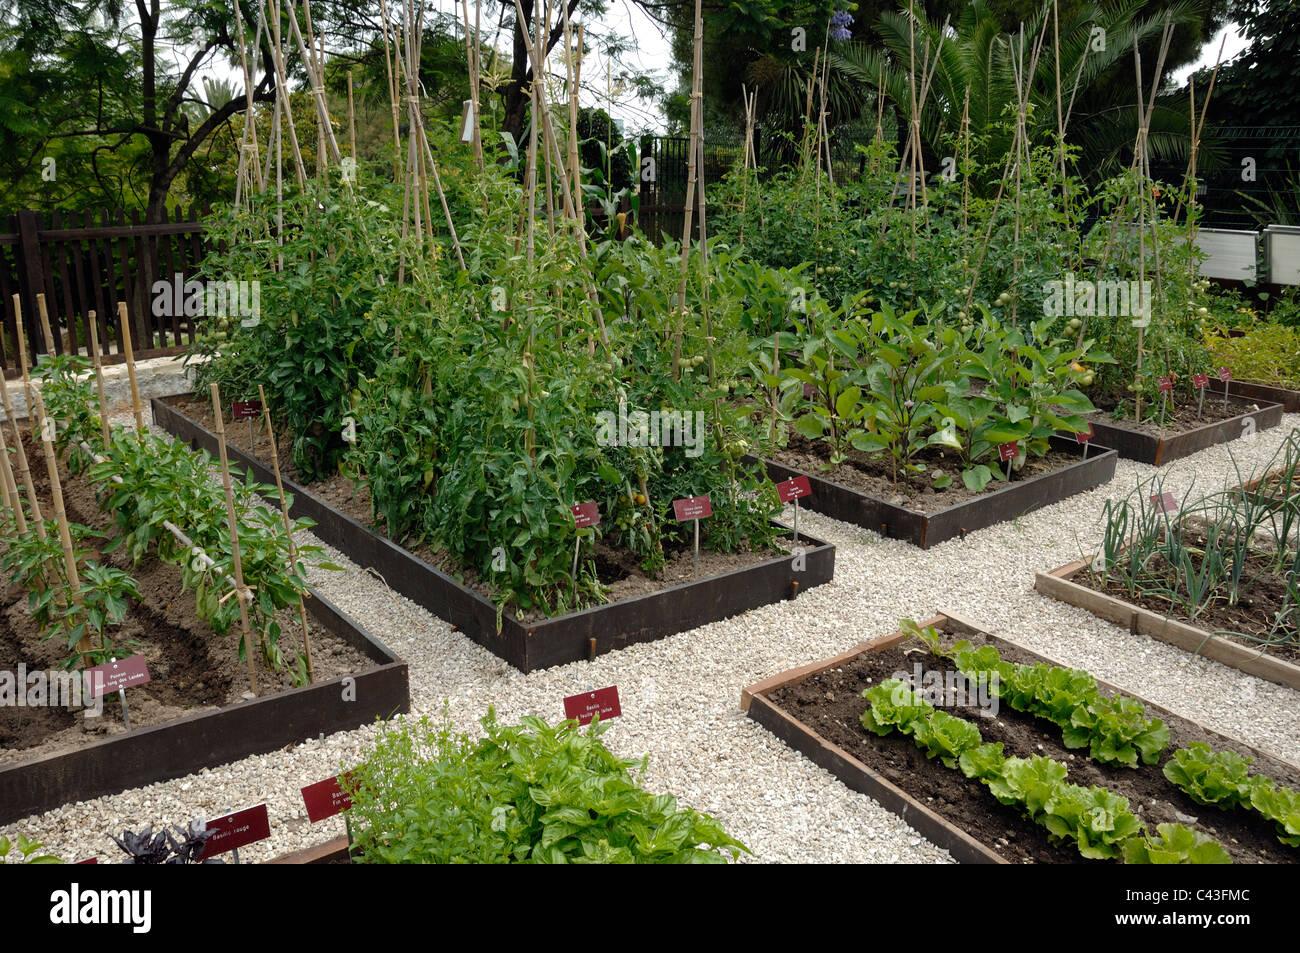 Vegetable Garden Potager Or Kitchen Garden With Tomato